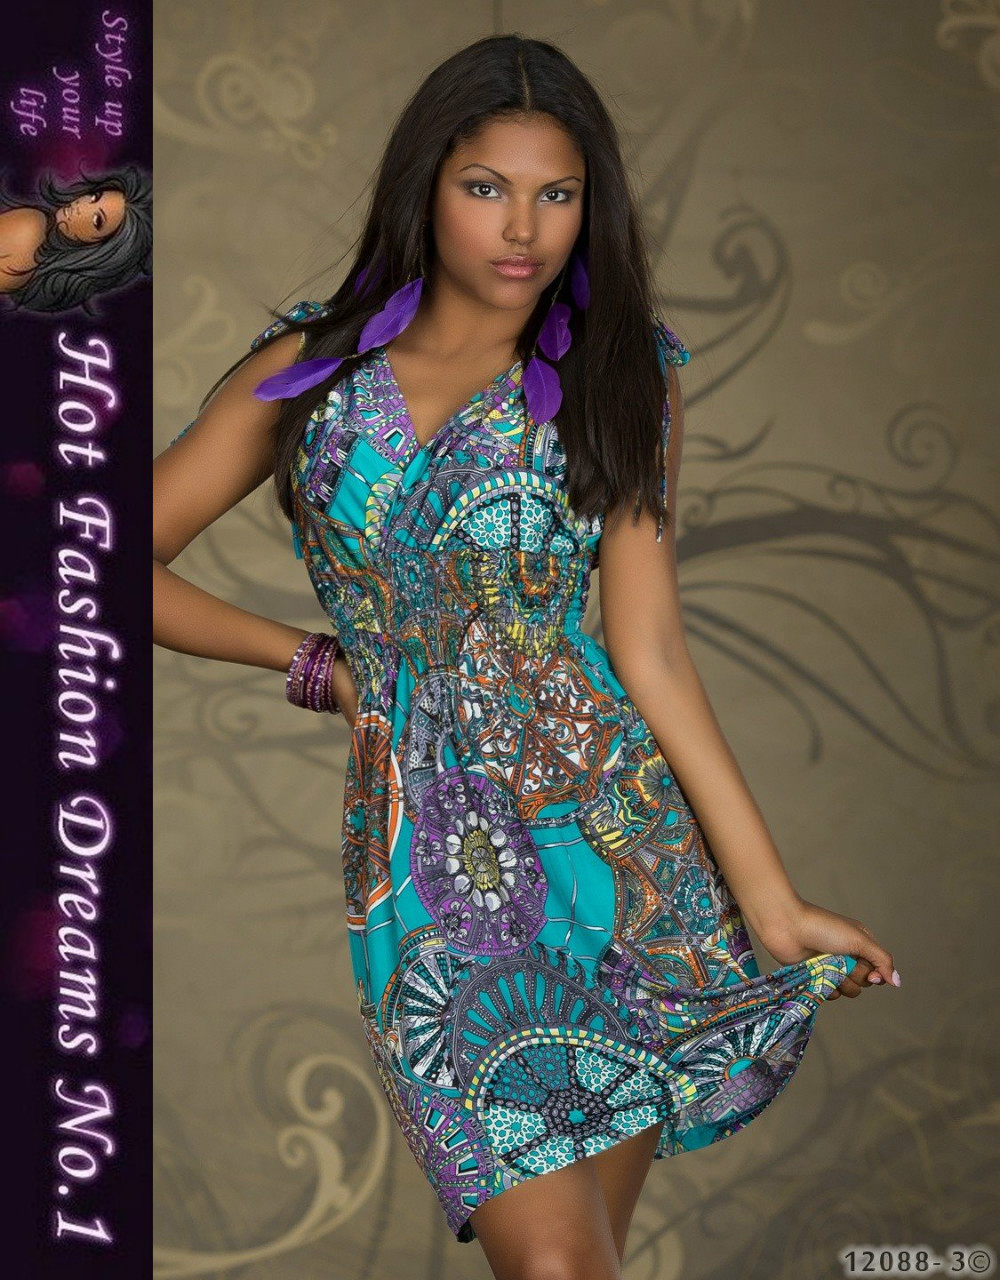 M XXL Plus Size 2014 New Fashion Women Floral Printed Vintage Mini Dress 4152 | Amazing Shoes UK